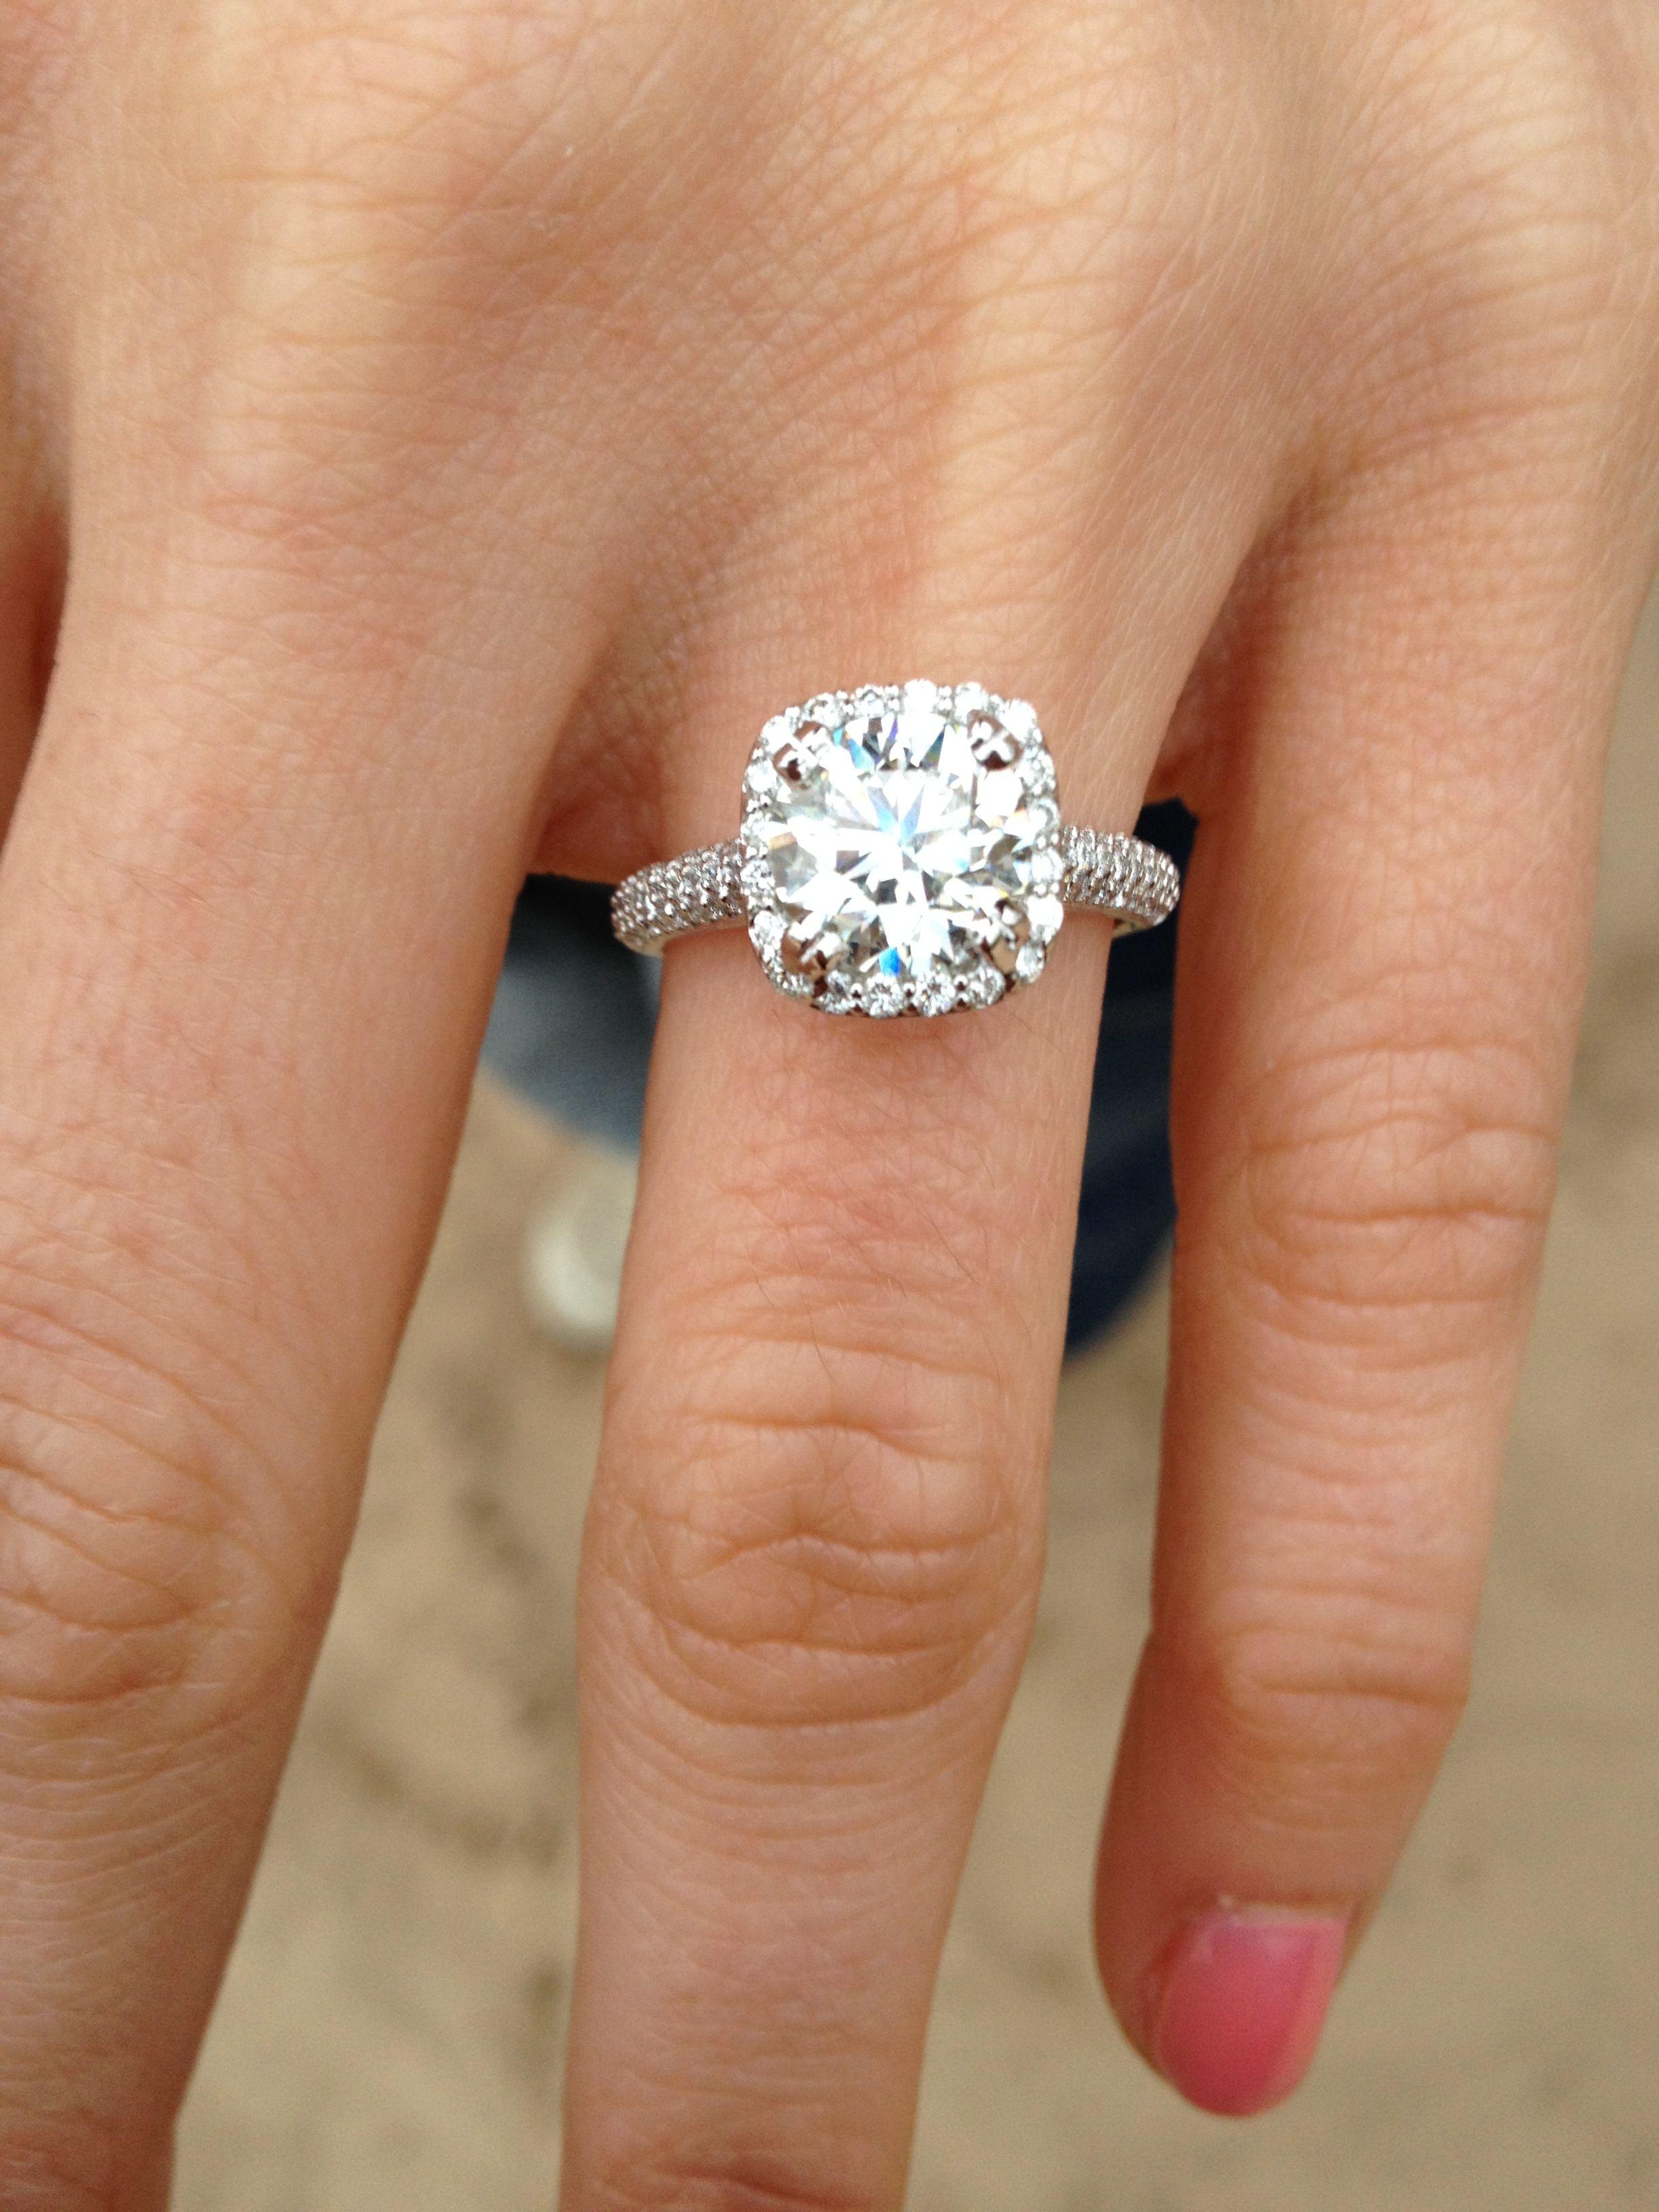 Engagement ring wedding engagement diamonds (With